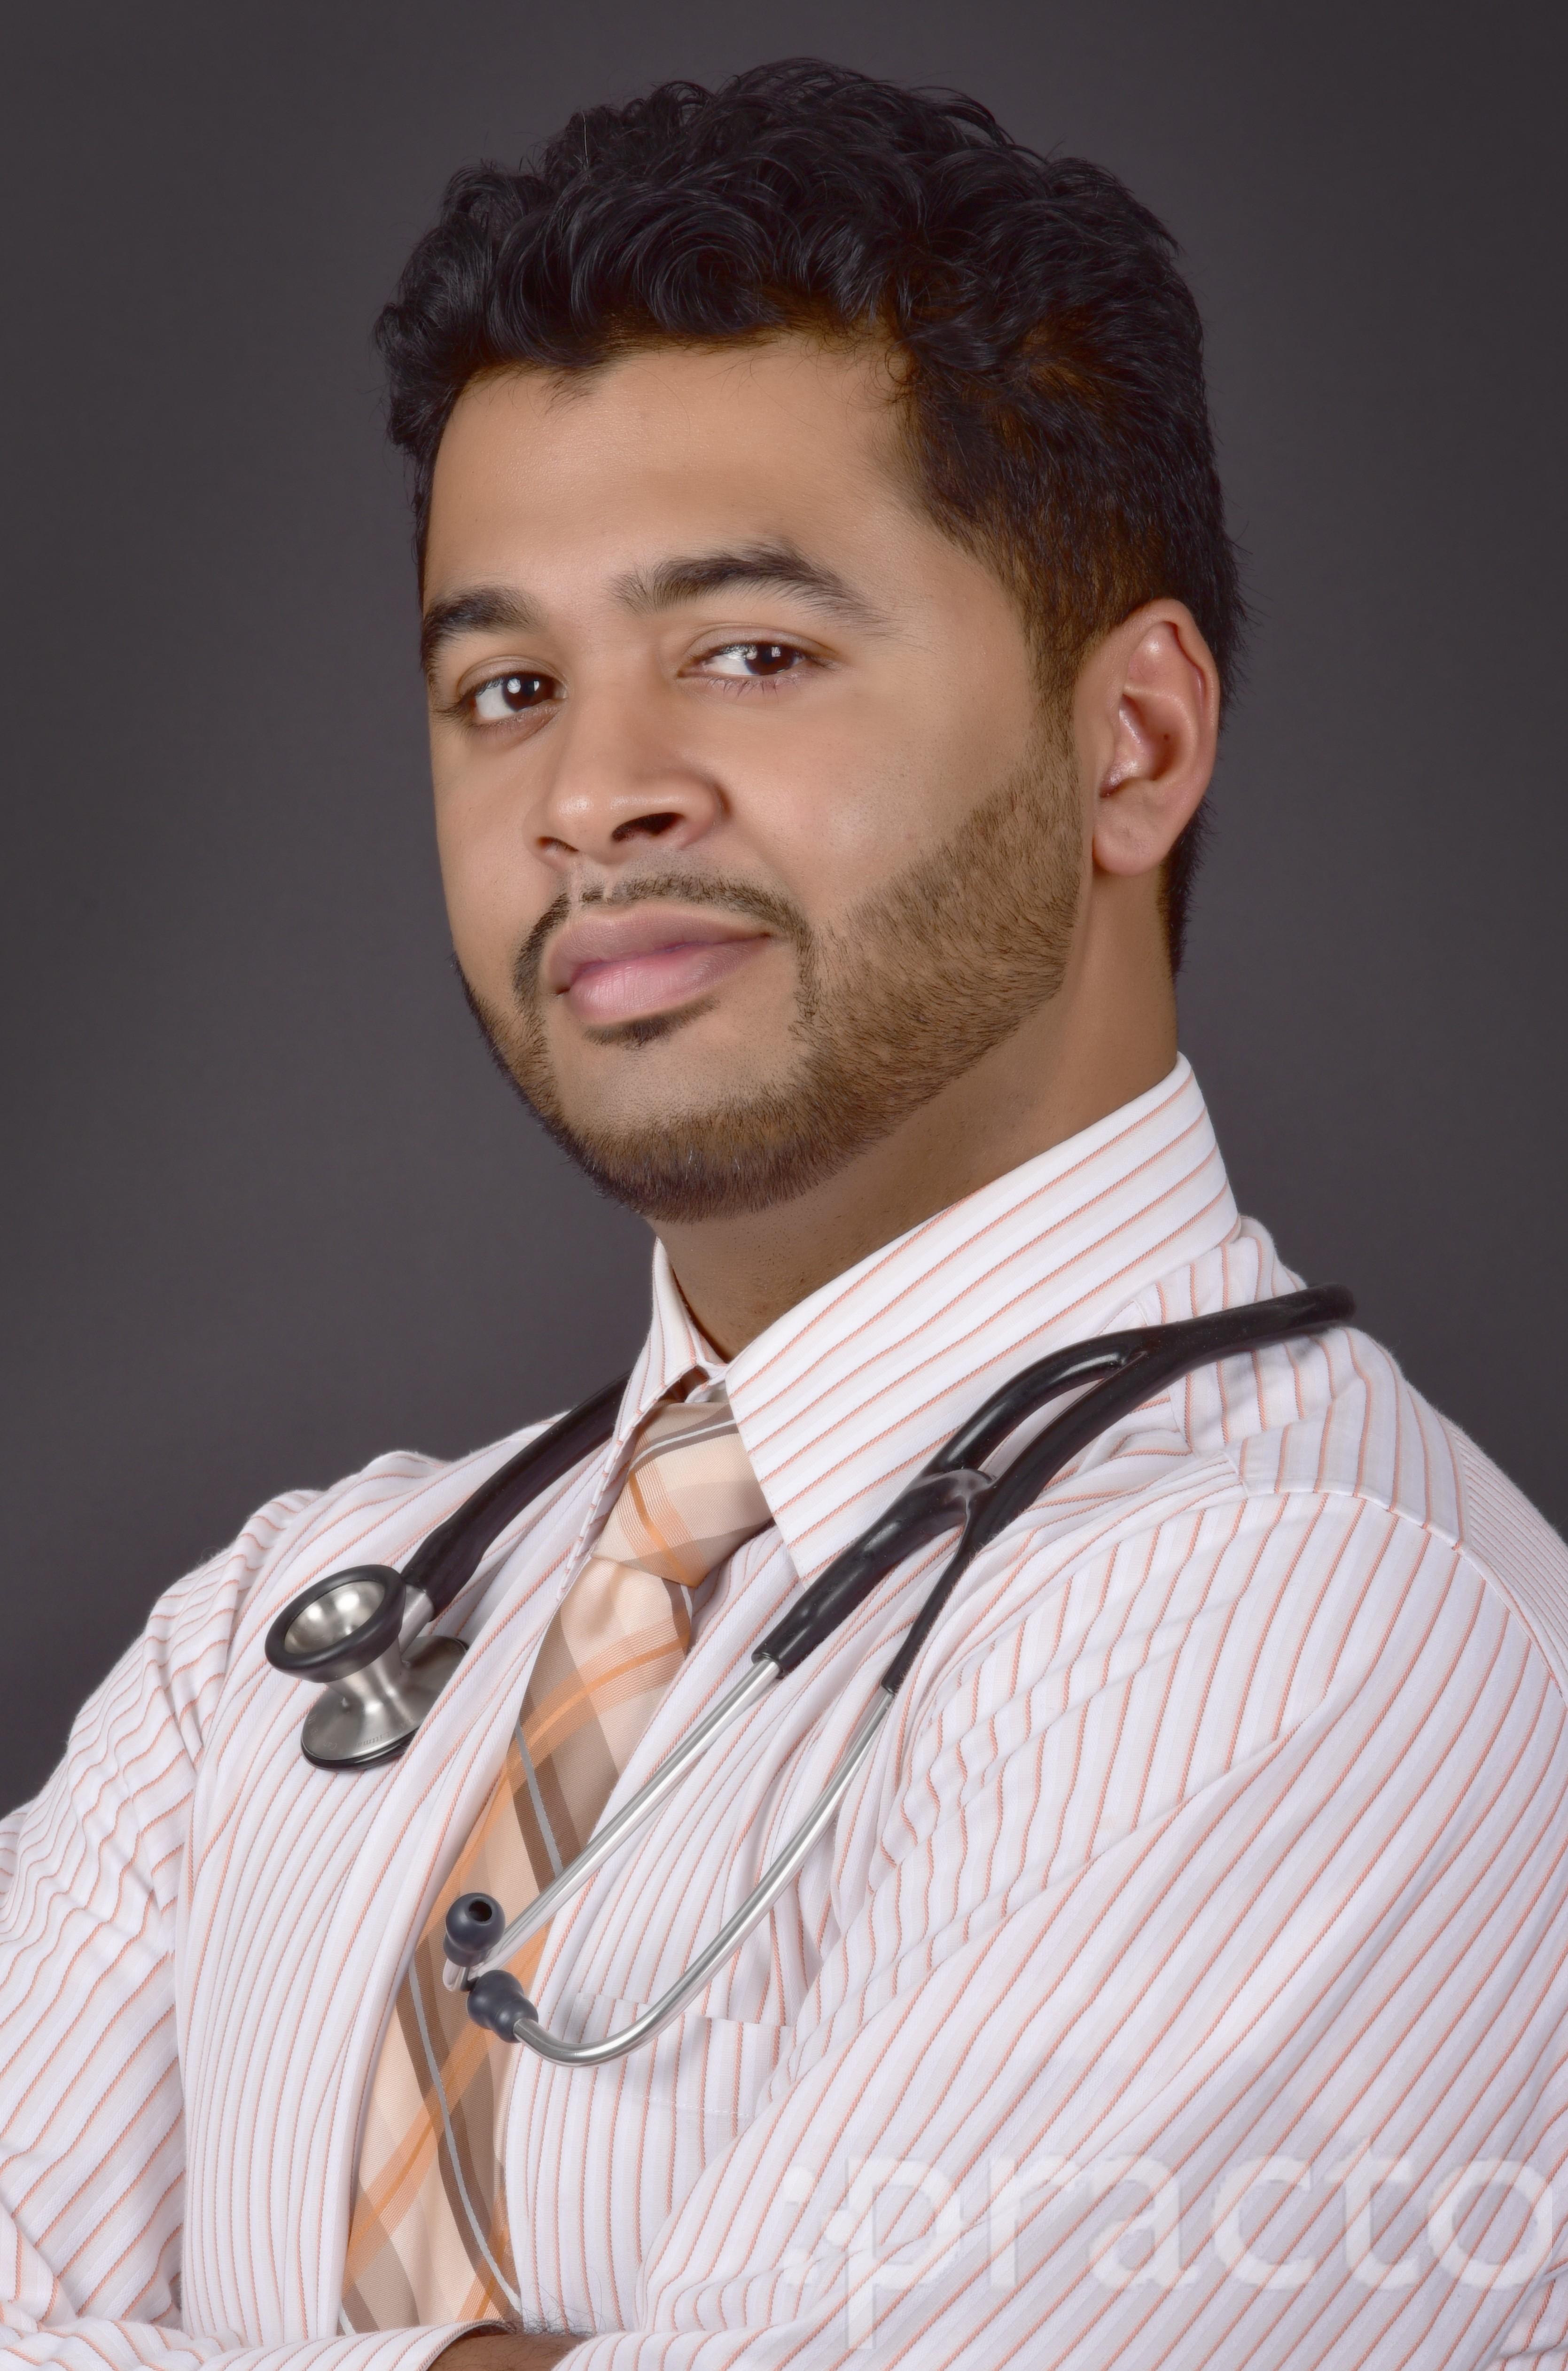 Dr. Prathap Addageethala - Chiropractor